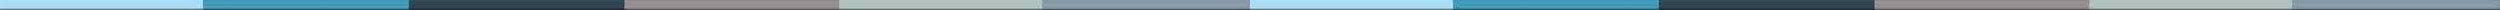 barra colores rosemblak.jpg